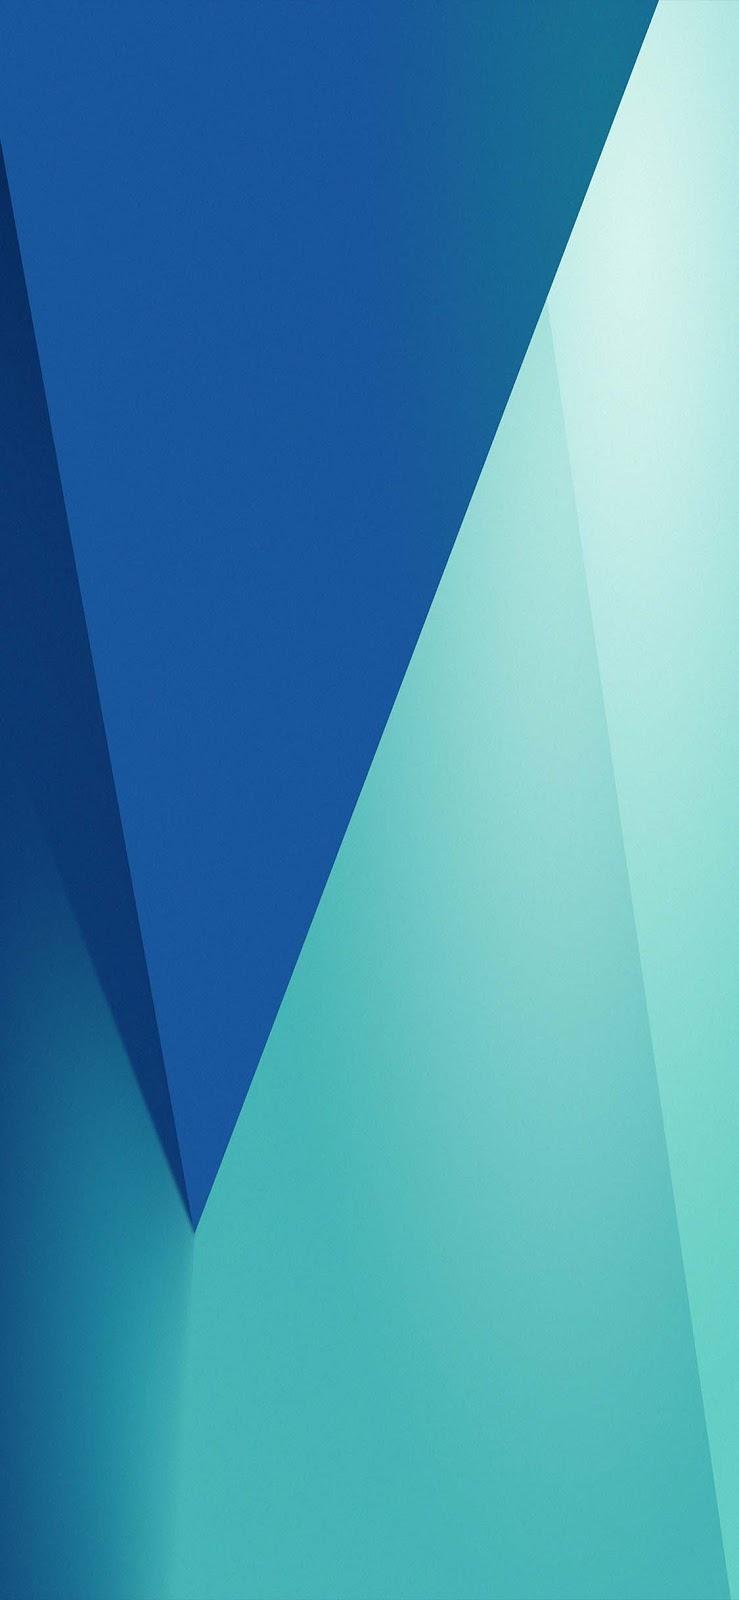 Download Hd Iphone 8 8 Plus Iphone X Wallpapers Dezignhd Best